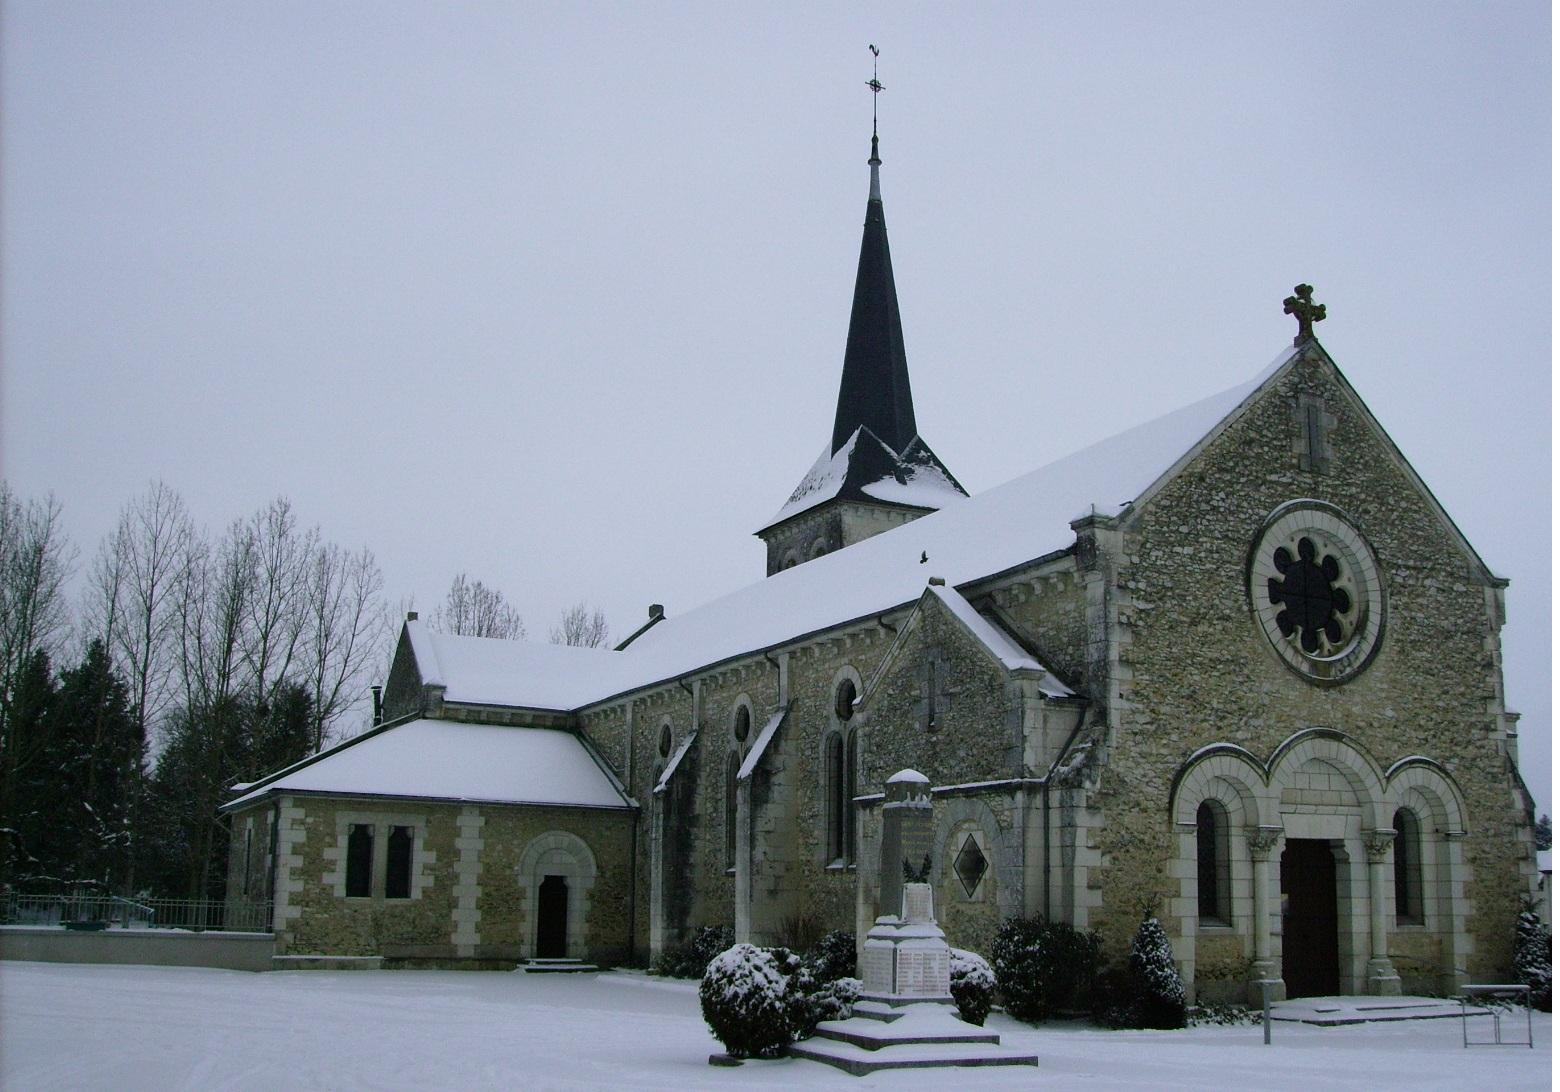 saisons/hiver-eglise-enneig-e-2.JPG